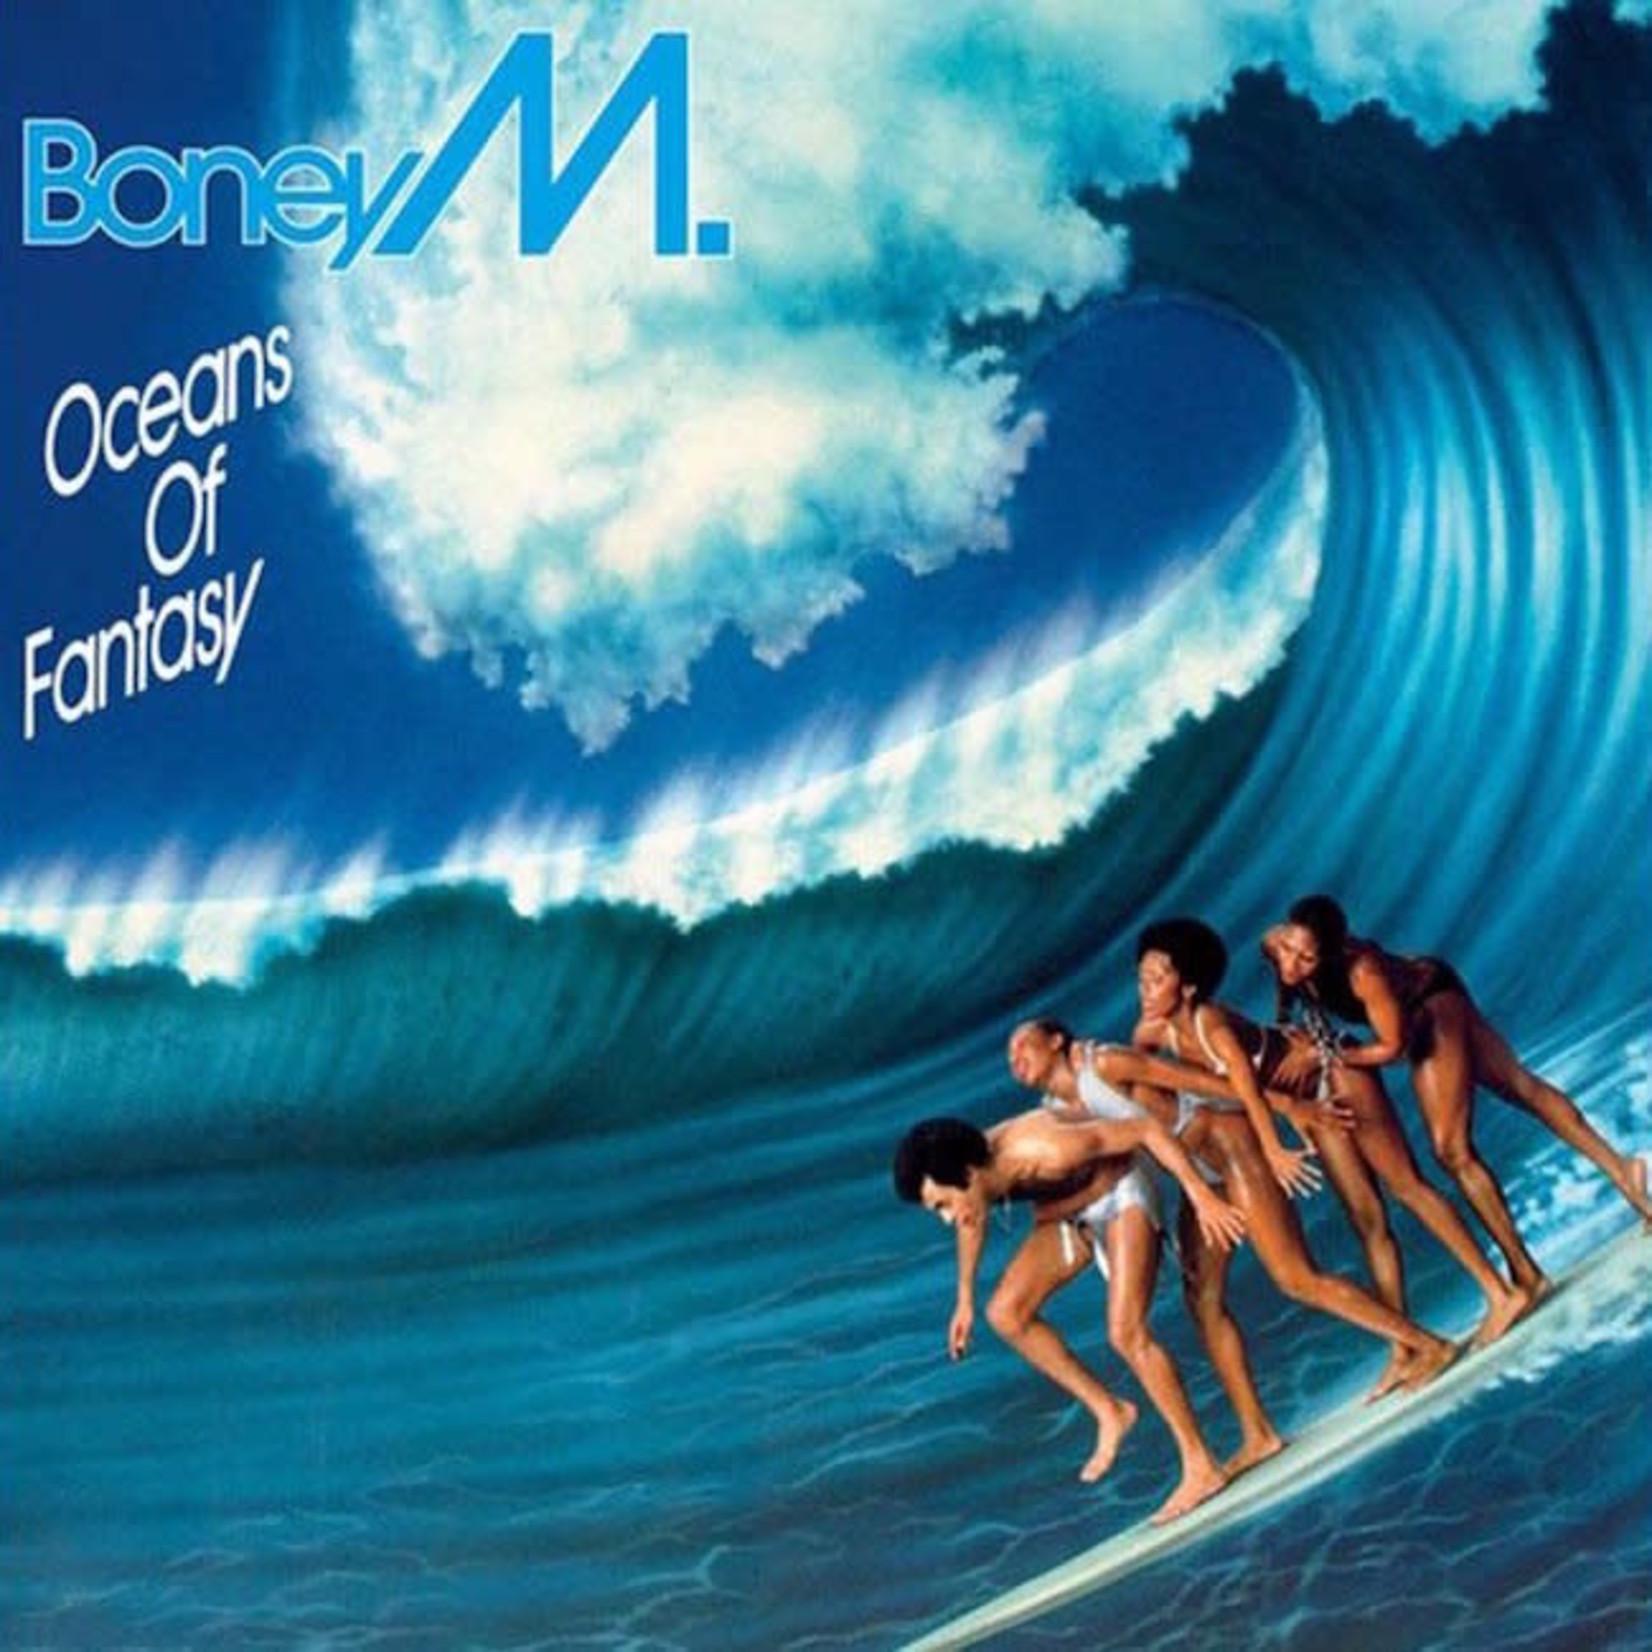 [Vintage] Boney M.: Oceans of Fantasy